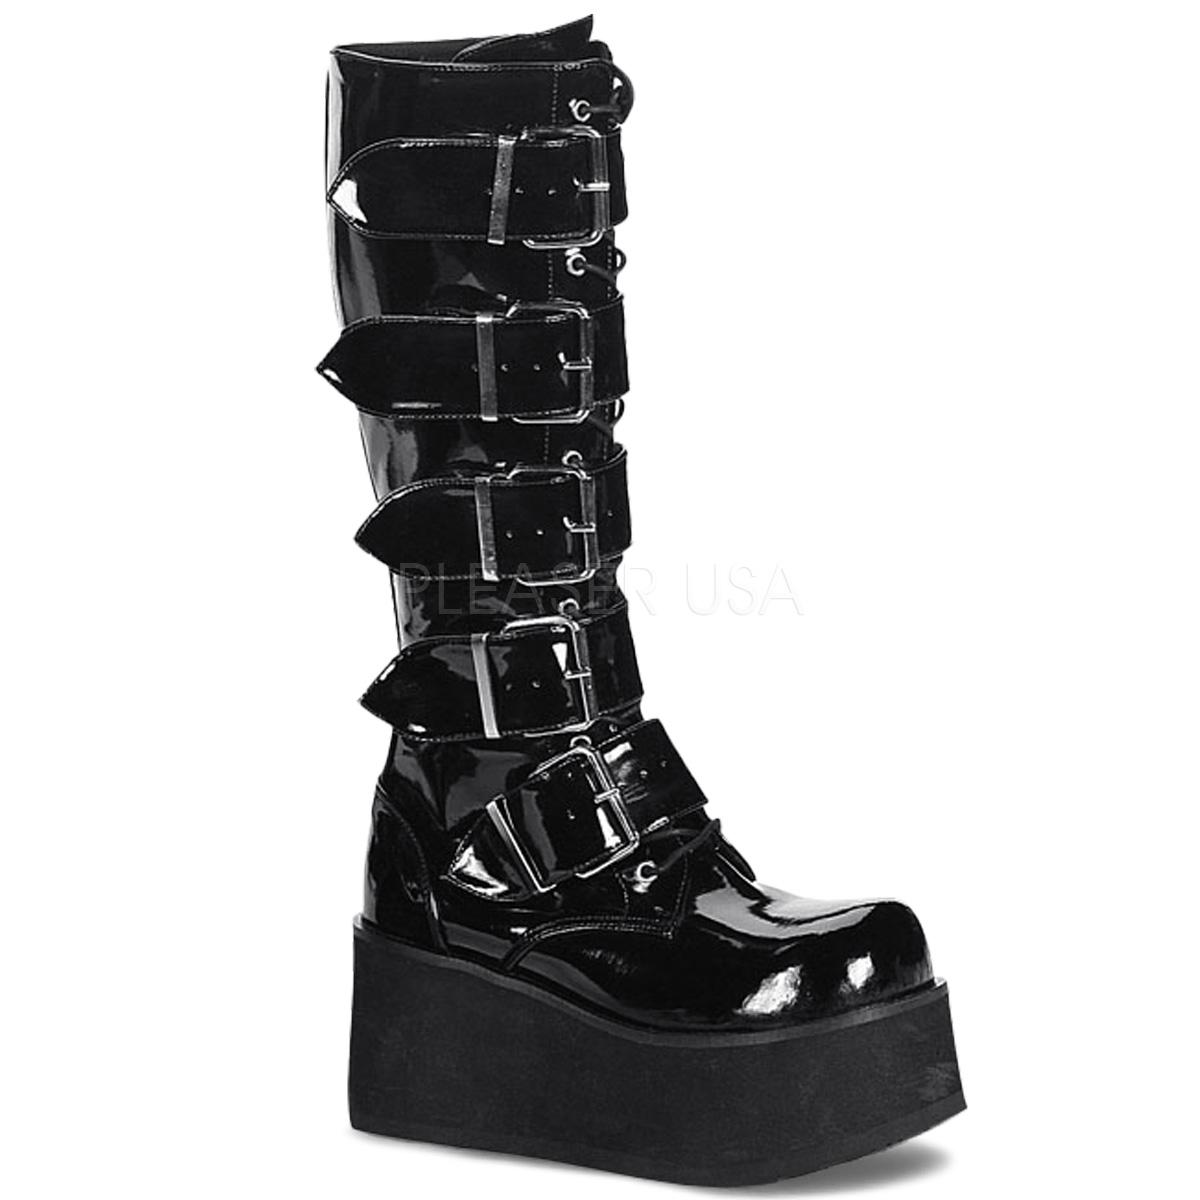 Demonia TRASHVILLE-518 3 1/4inch PF Goth Punk Pat Knee BT 5 Buckled W/ Zipper #Men's/UNISEX ◆取り寄せ